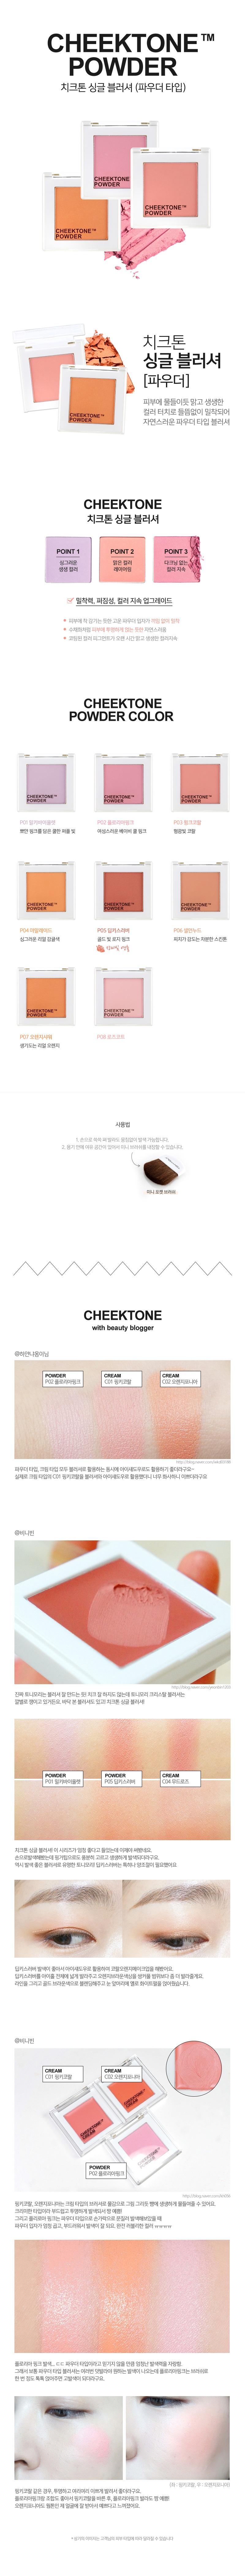 Tony Moly Cheektone Single Blusher Powder korean cosmetic makeup product online shop malaysia spain portugal1